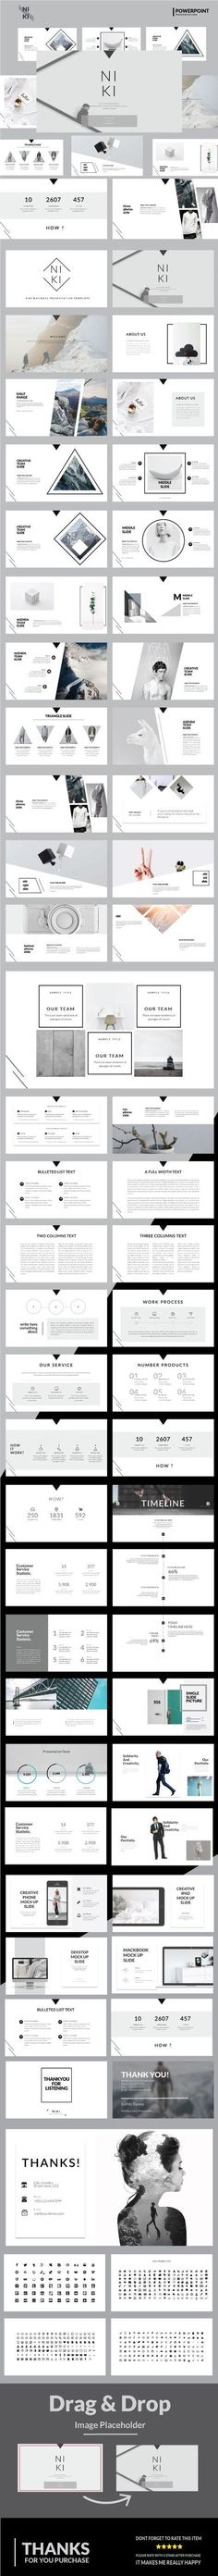 Niki Multipurpose Powerpoint Template - #Business #PowerPoint #Templates